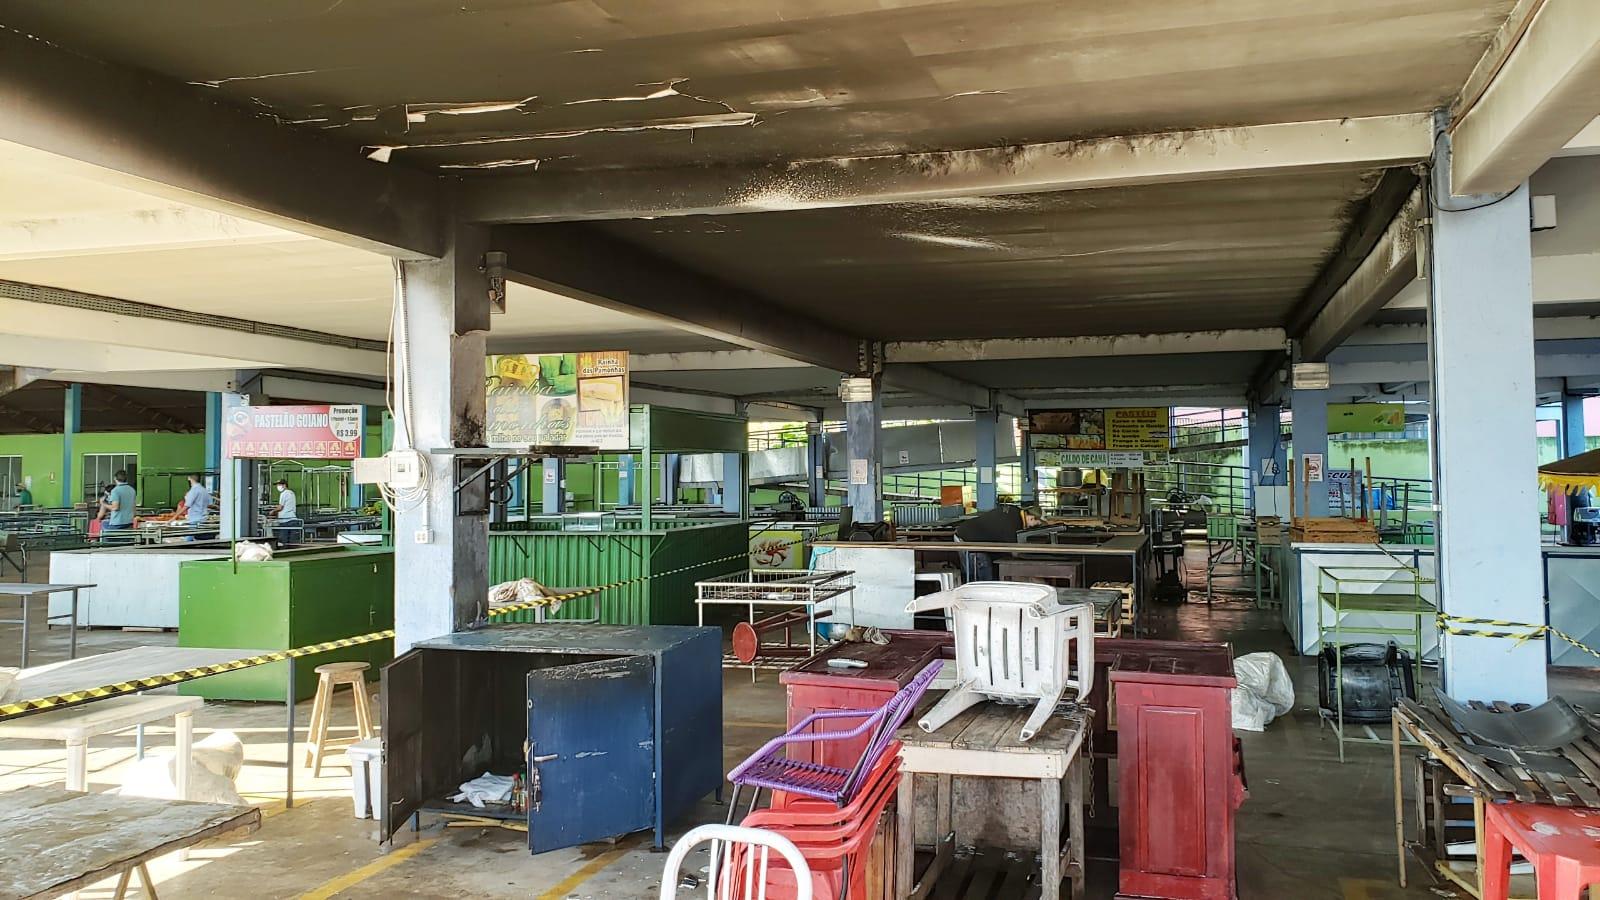 Curto-circuito em televisor pode ter provocado princípio de incêndio na feira de Guaraí